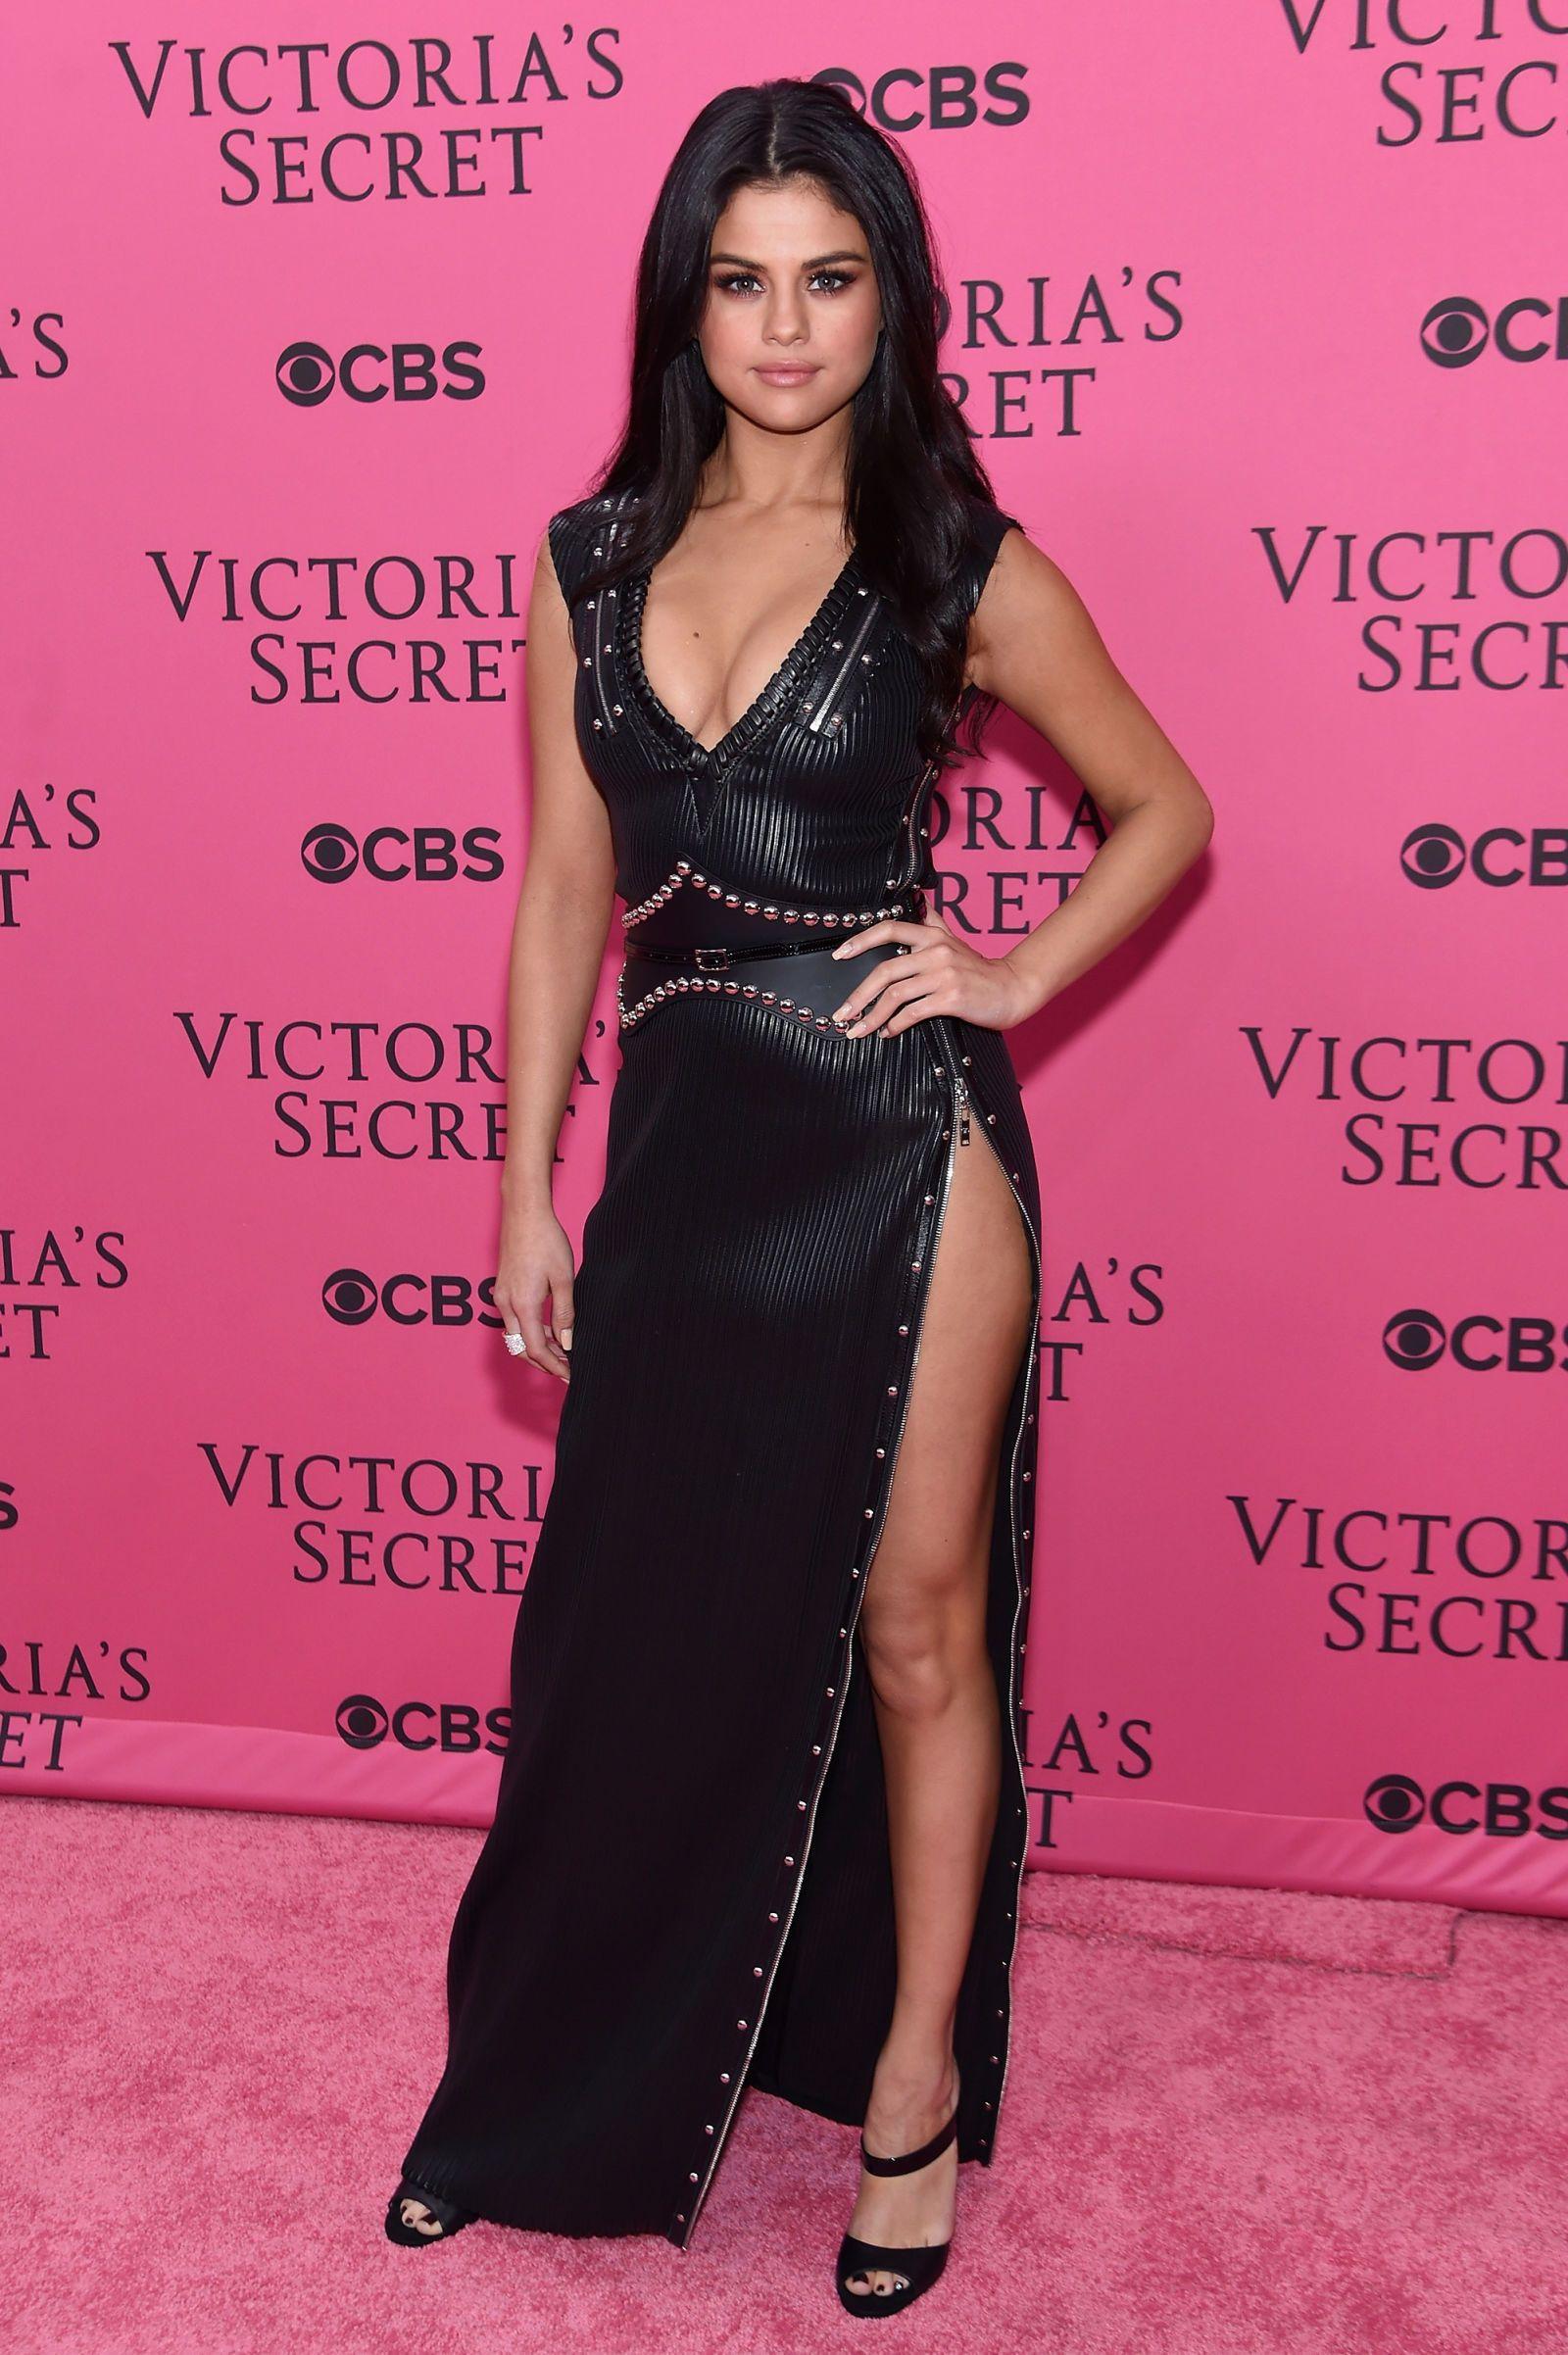 Lo stile di Selena Gomez -cosmopolitan.it | Celebs | Pinterest ...